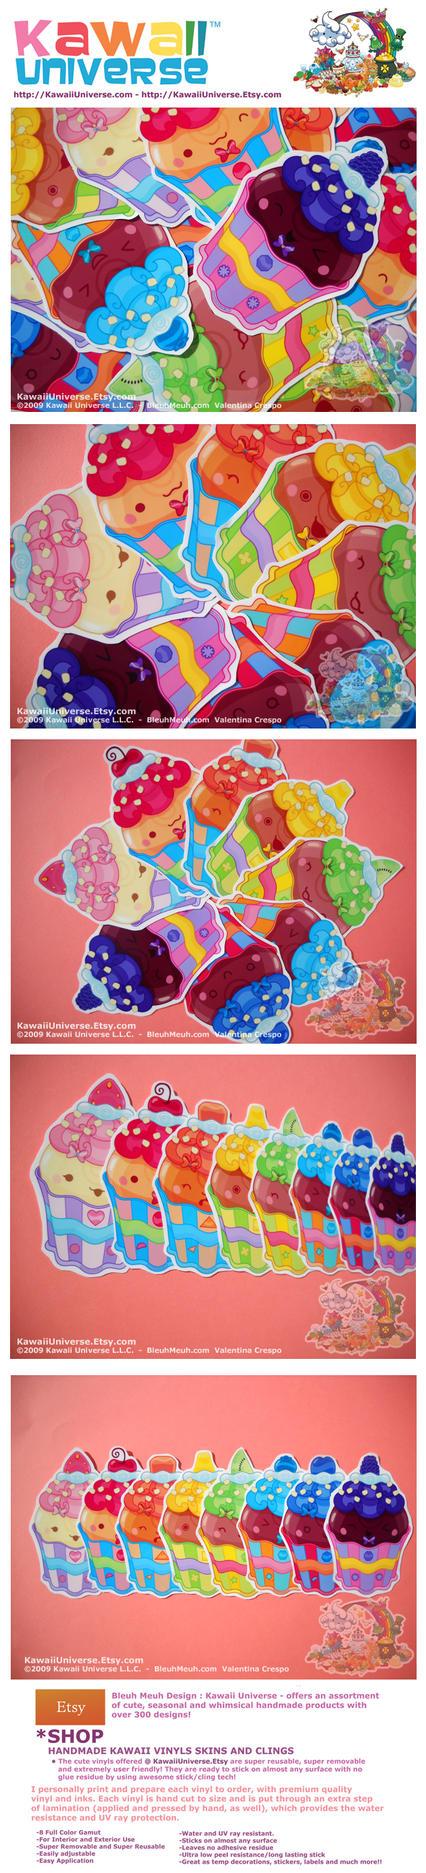 Kawaii Handmade Cupcake Vinyls by KawaiiUniverseStudio